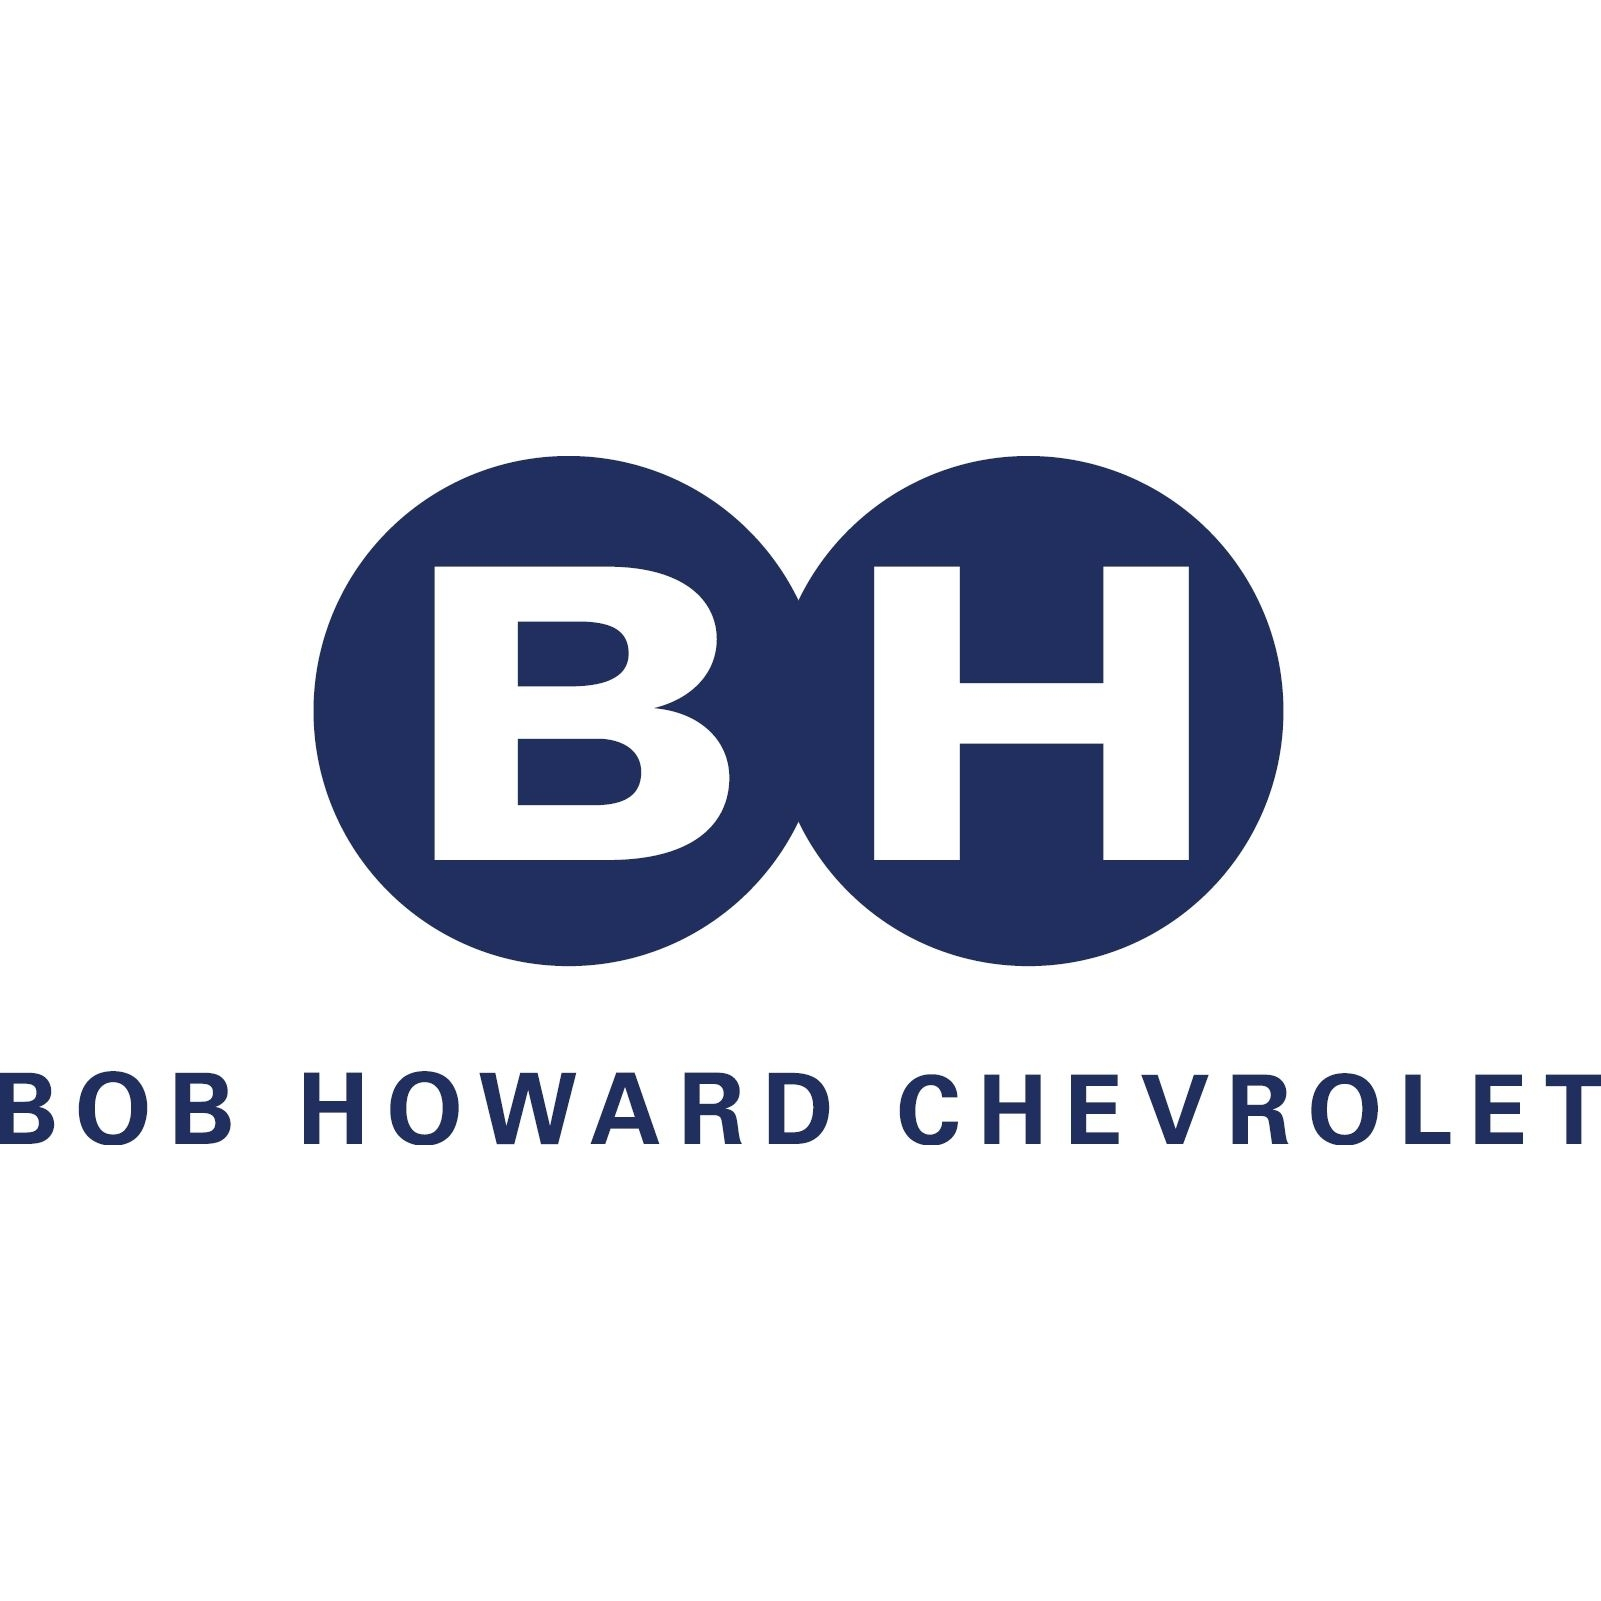 Bob Howard Chevrolet